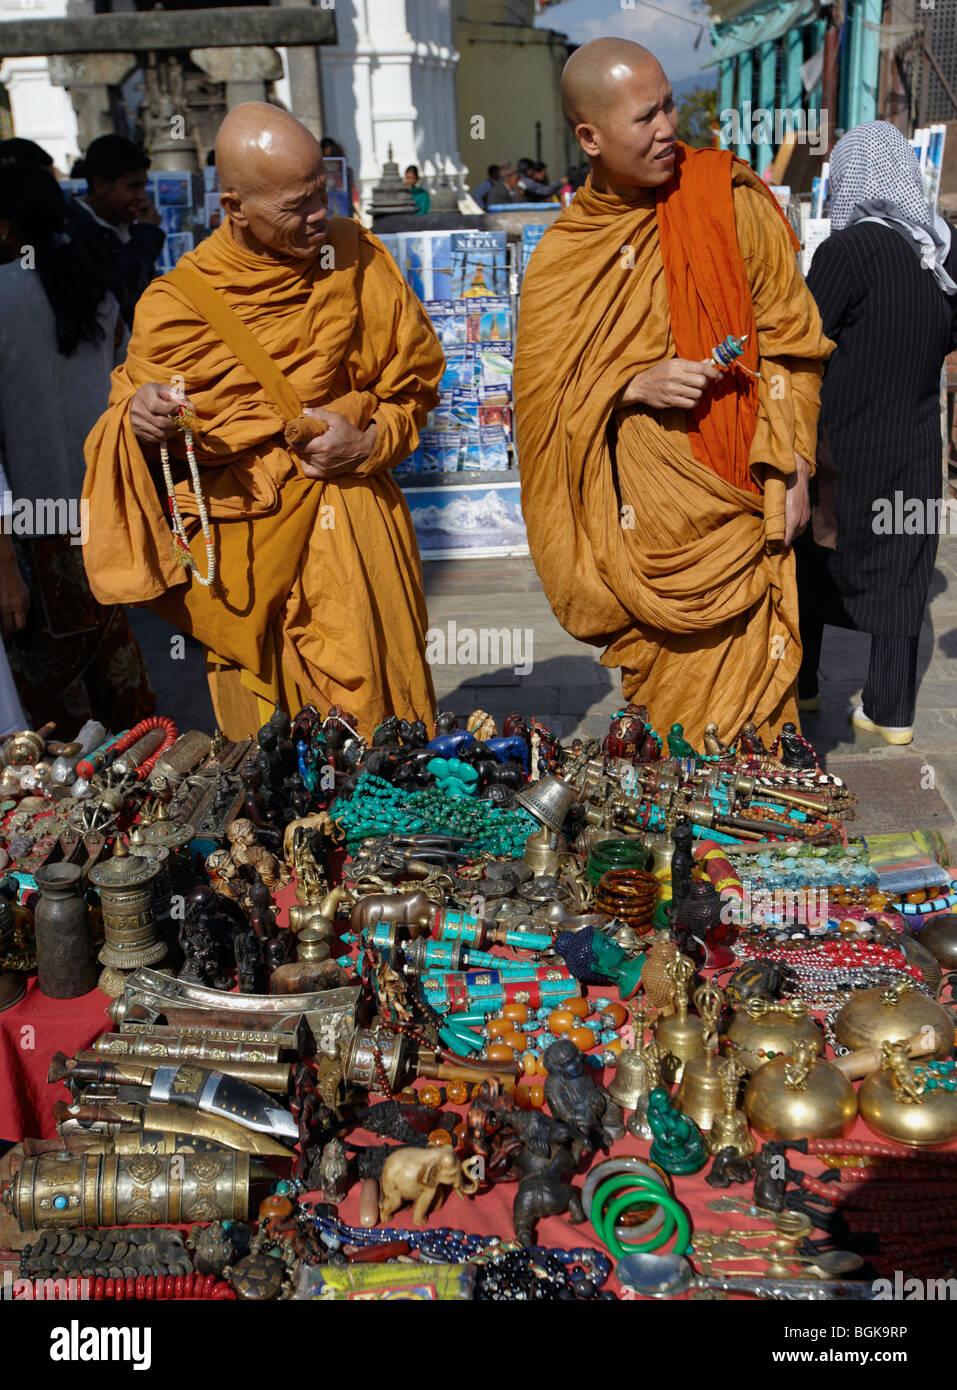 Buddhist Monks Shopping  In Durbar Square Kathmandu Nepal Asia - Stock Image